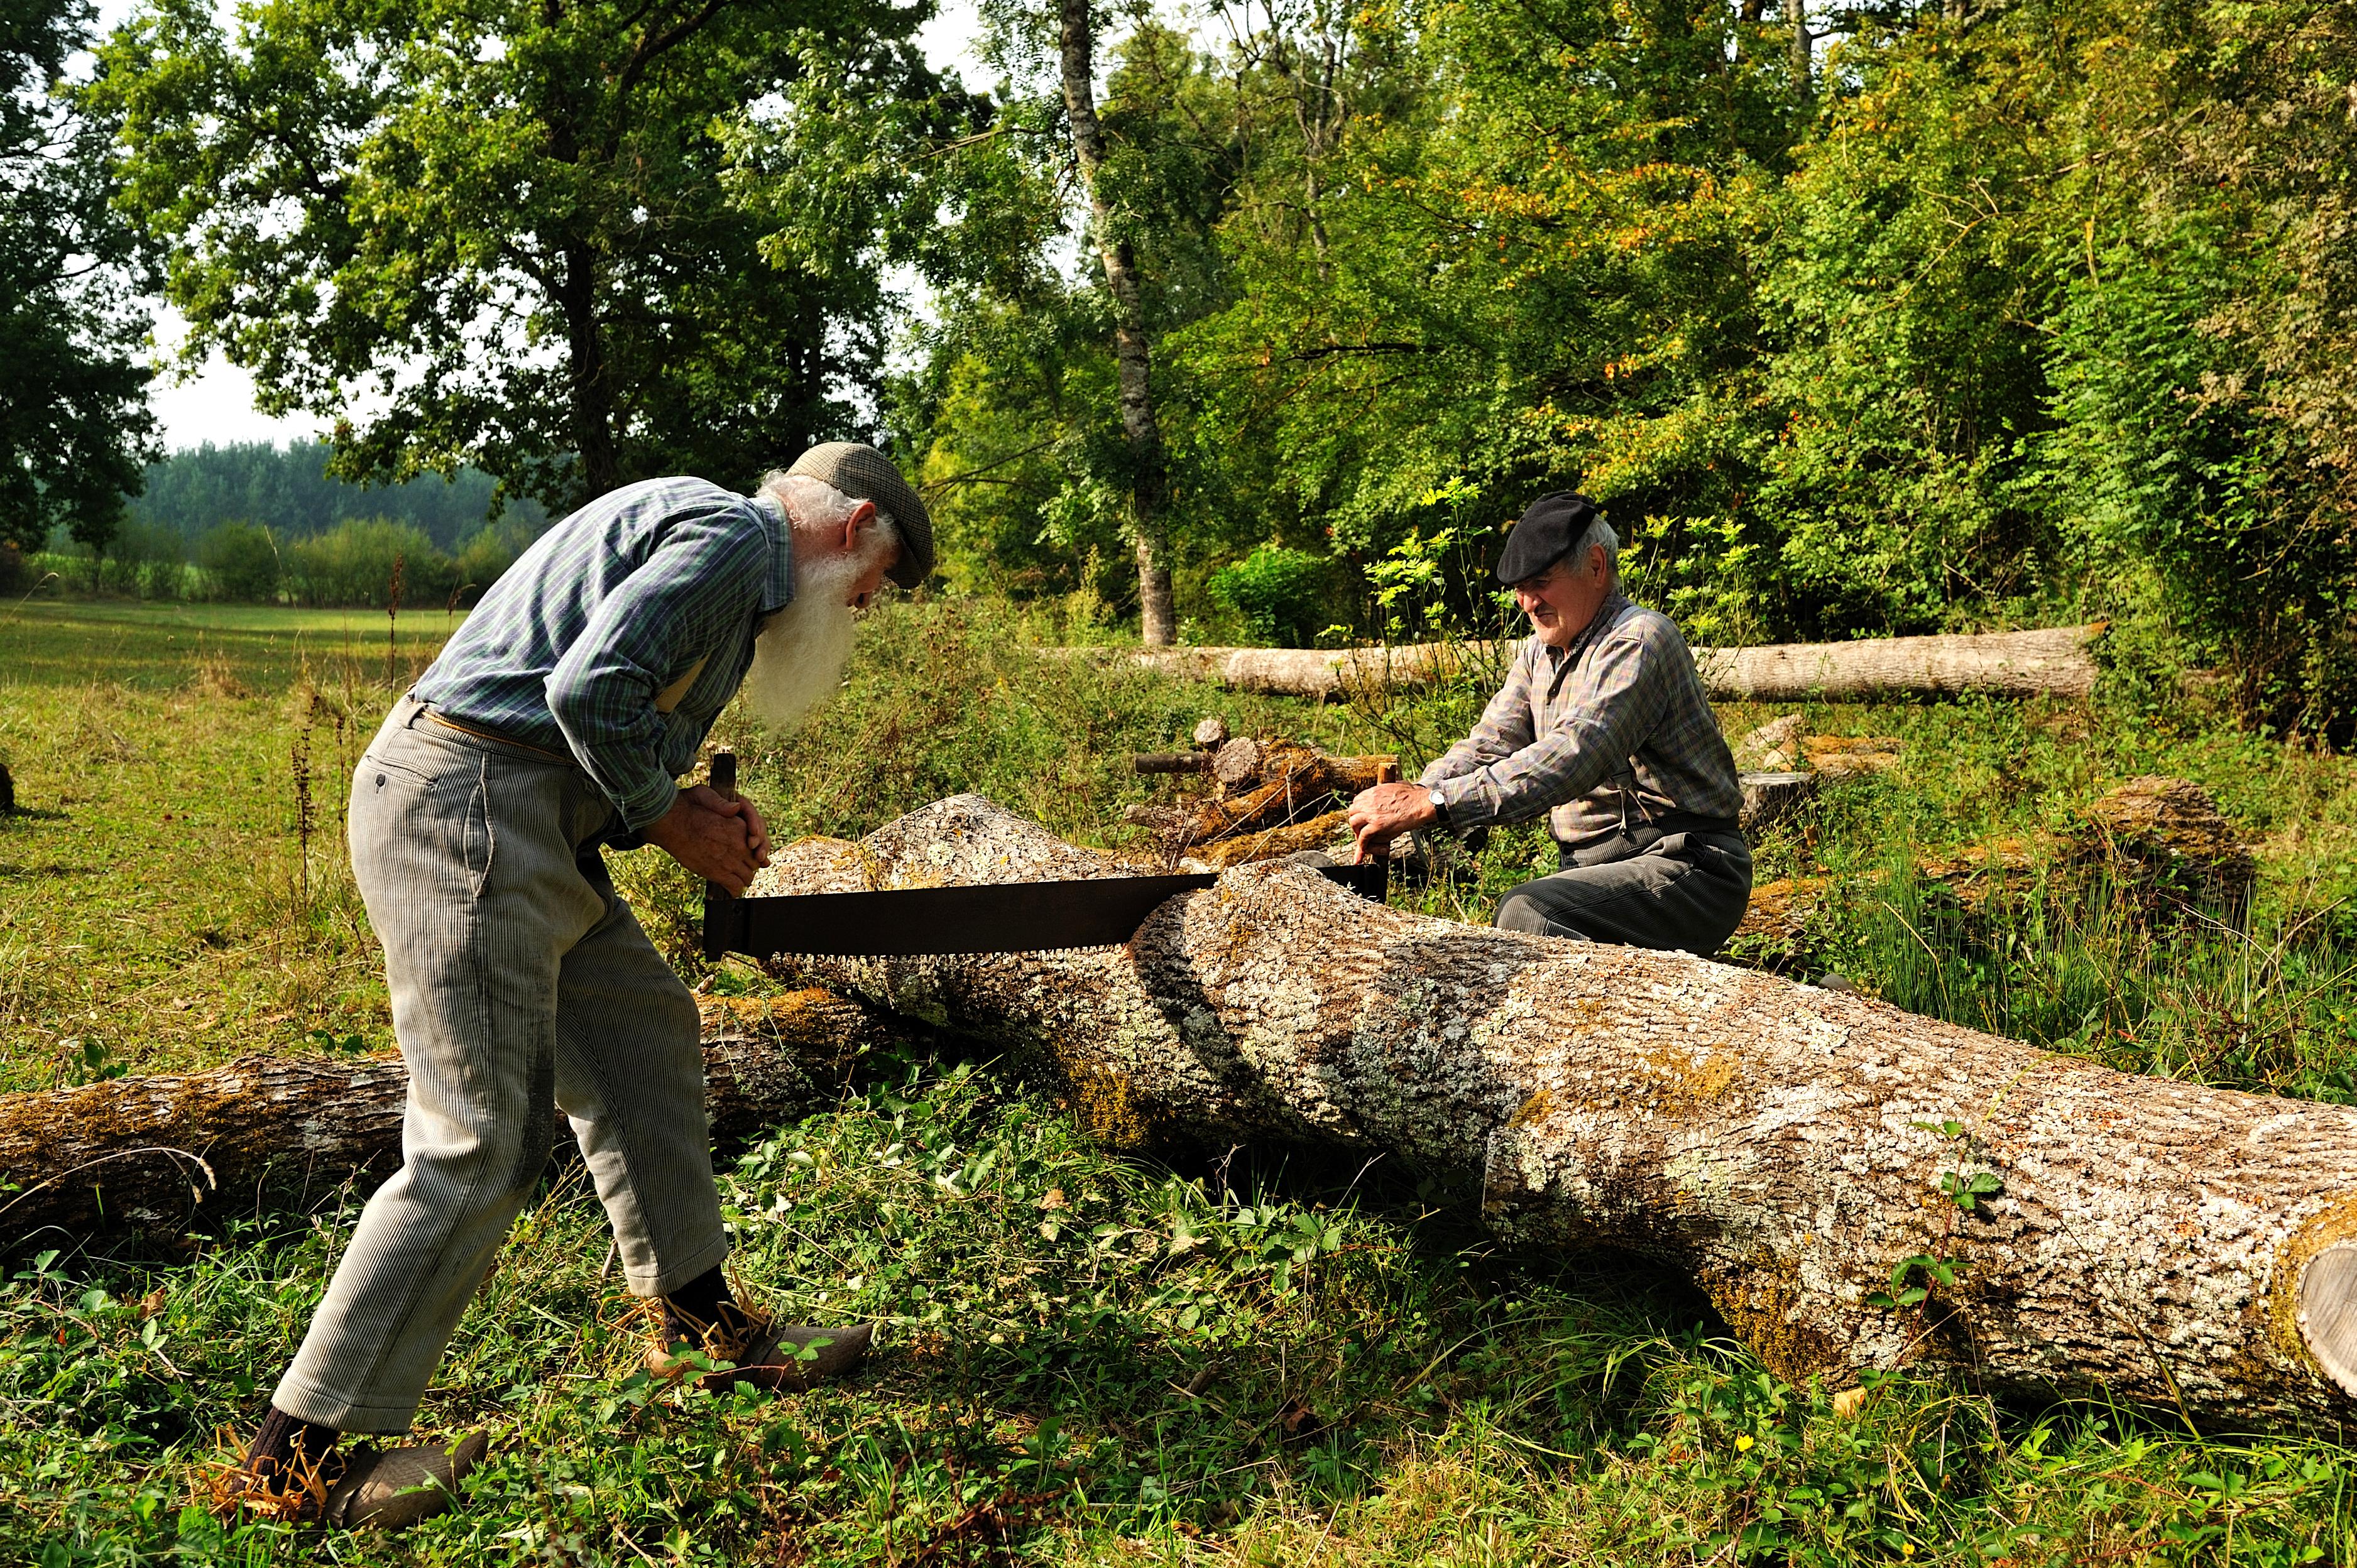 Two men sawing wood